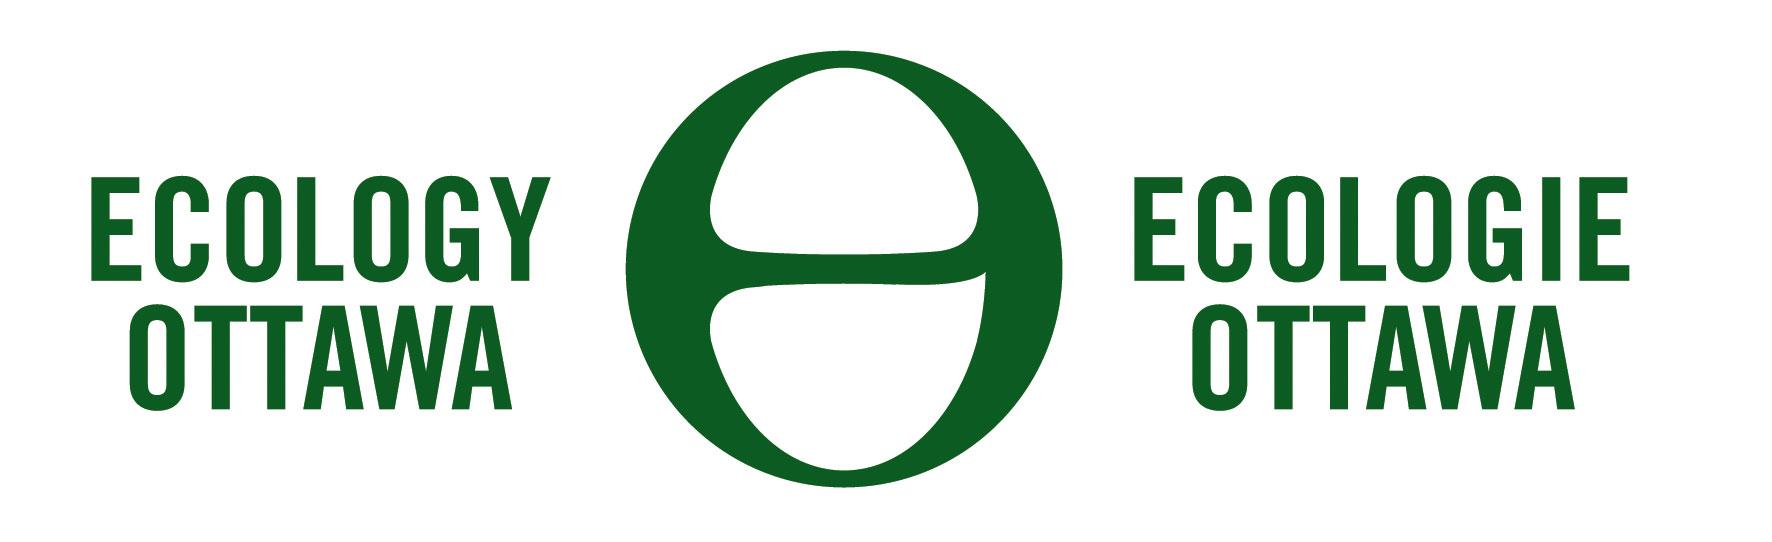 Ecology Ottawa Logo